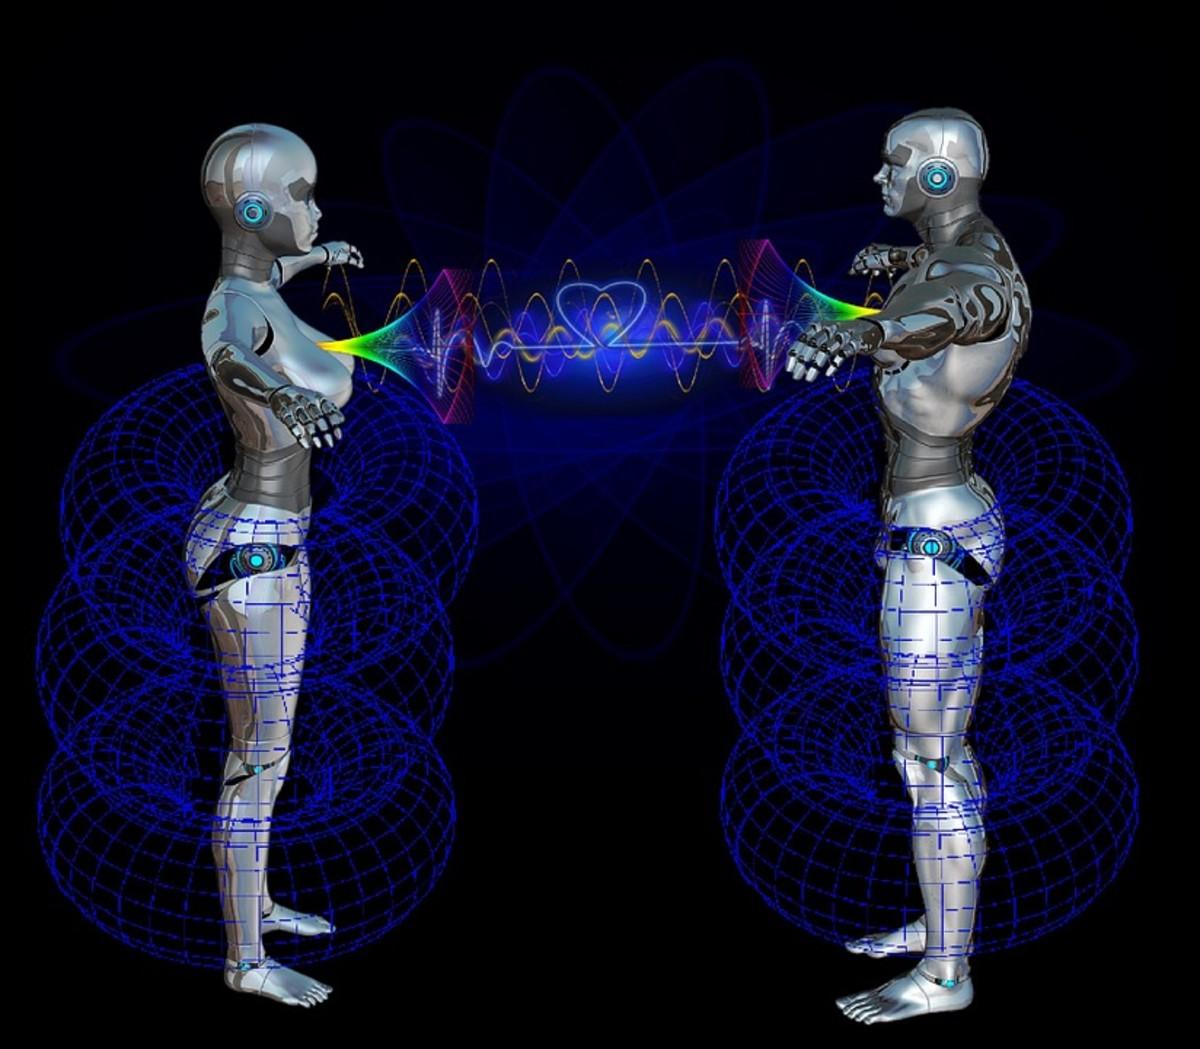 extra-sensory-perception-the-reality-that-most-deny